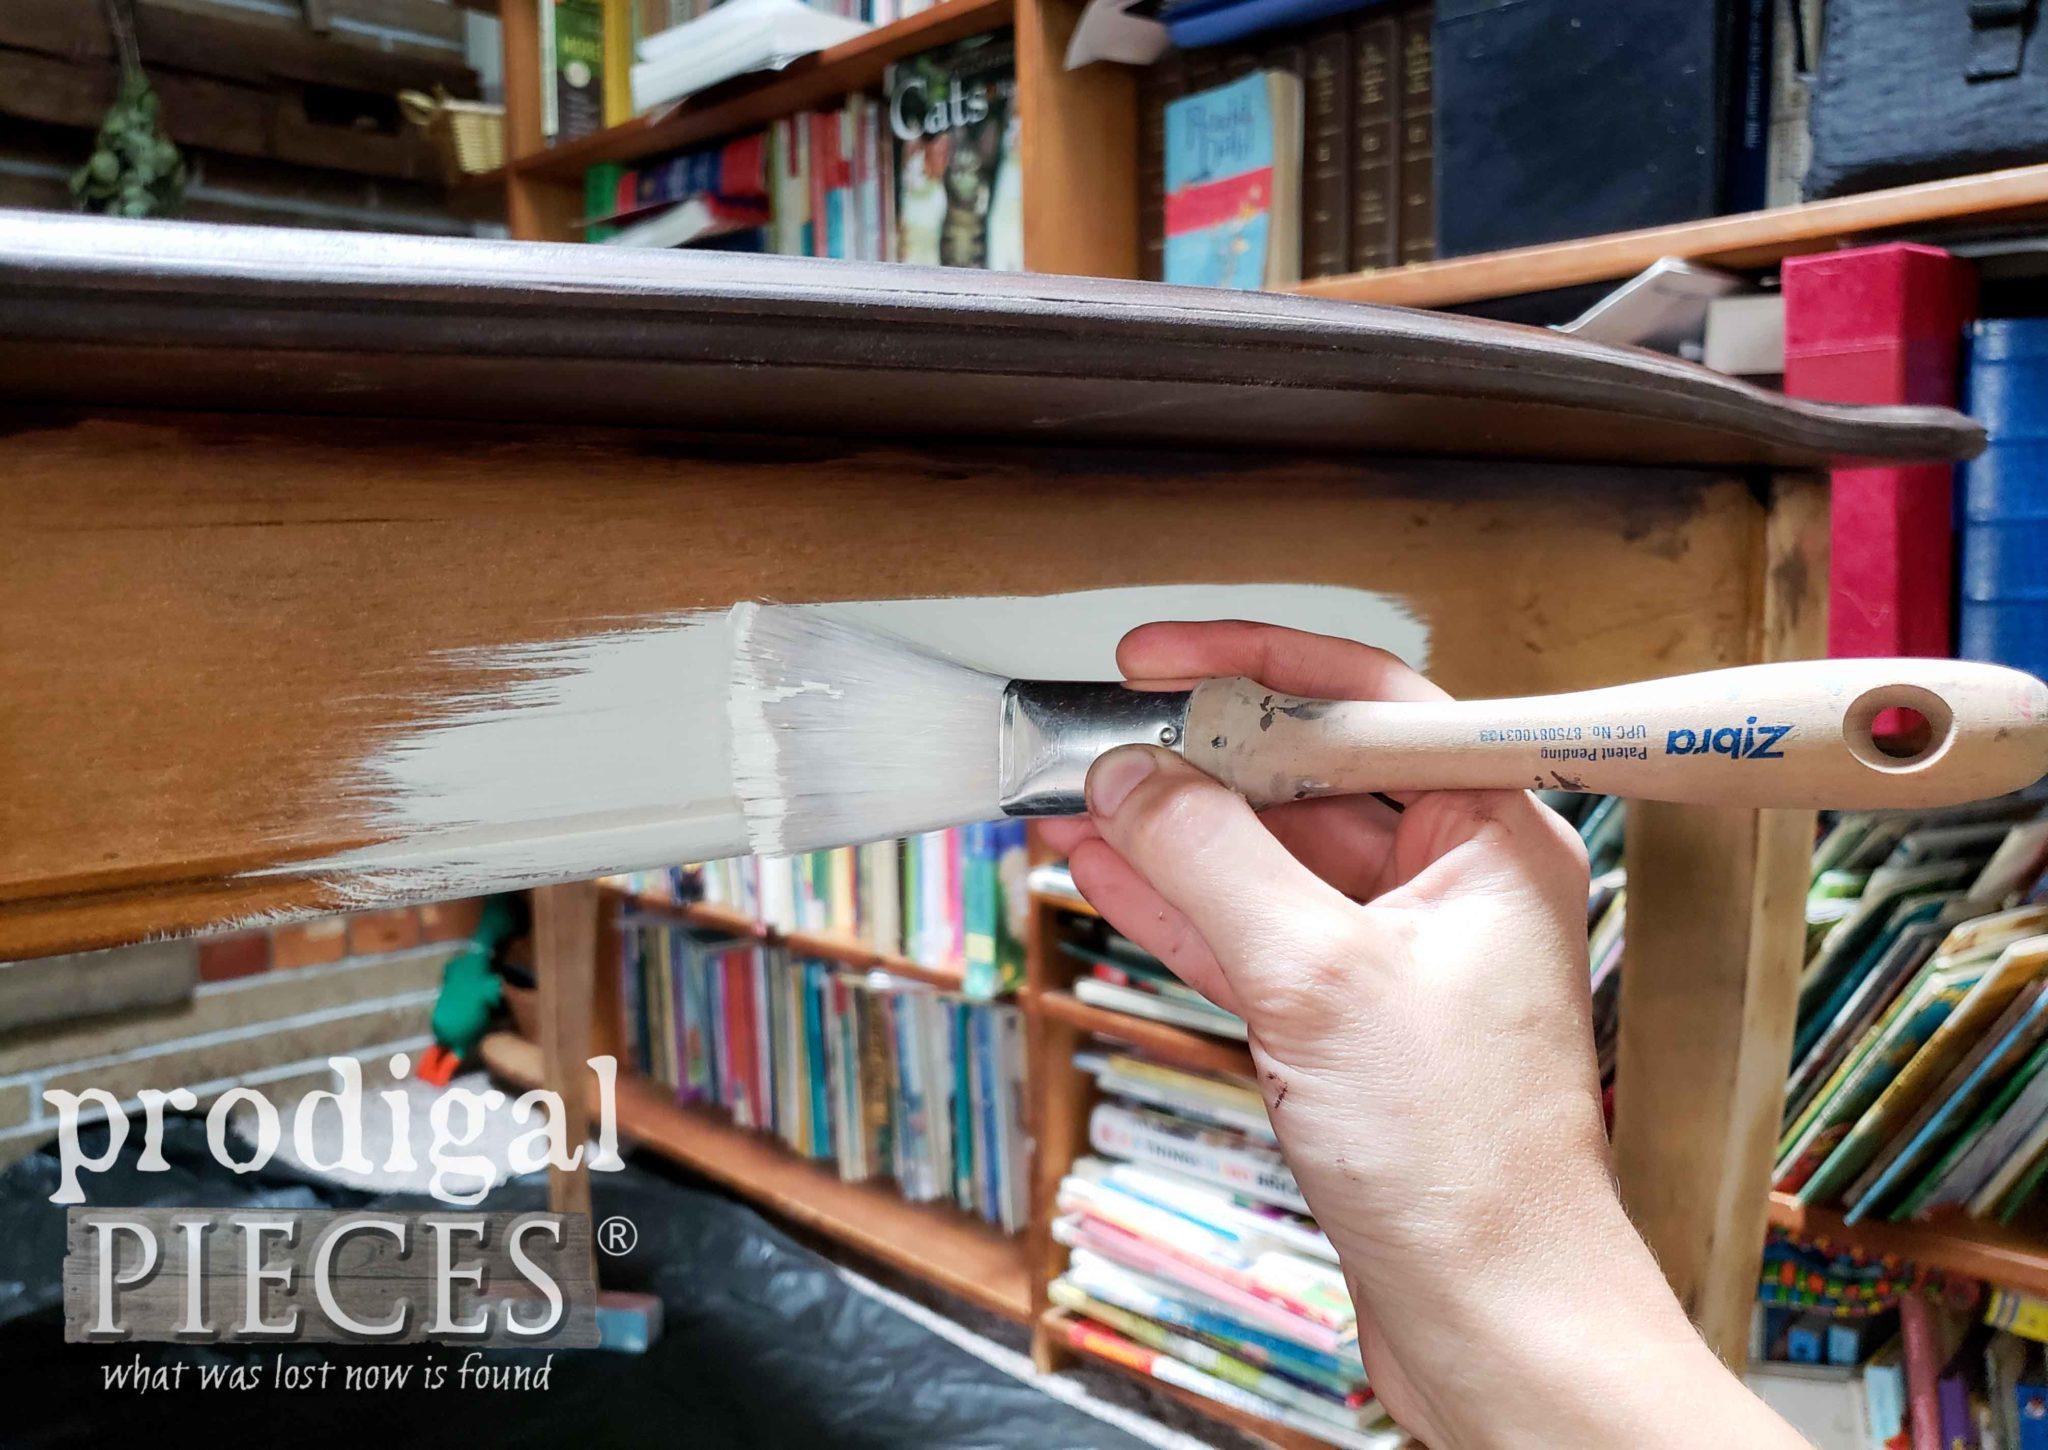 Zibra Fan Paint Brush to Paint Dining Table by Prodigal Pieces | prodigalpieces.com